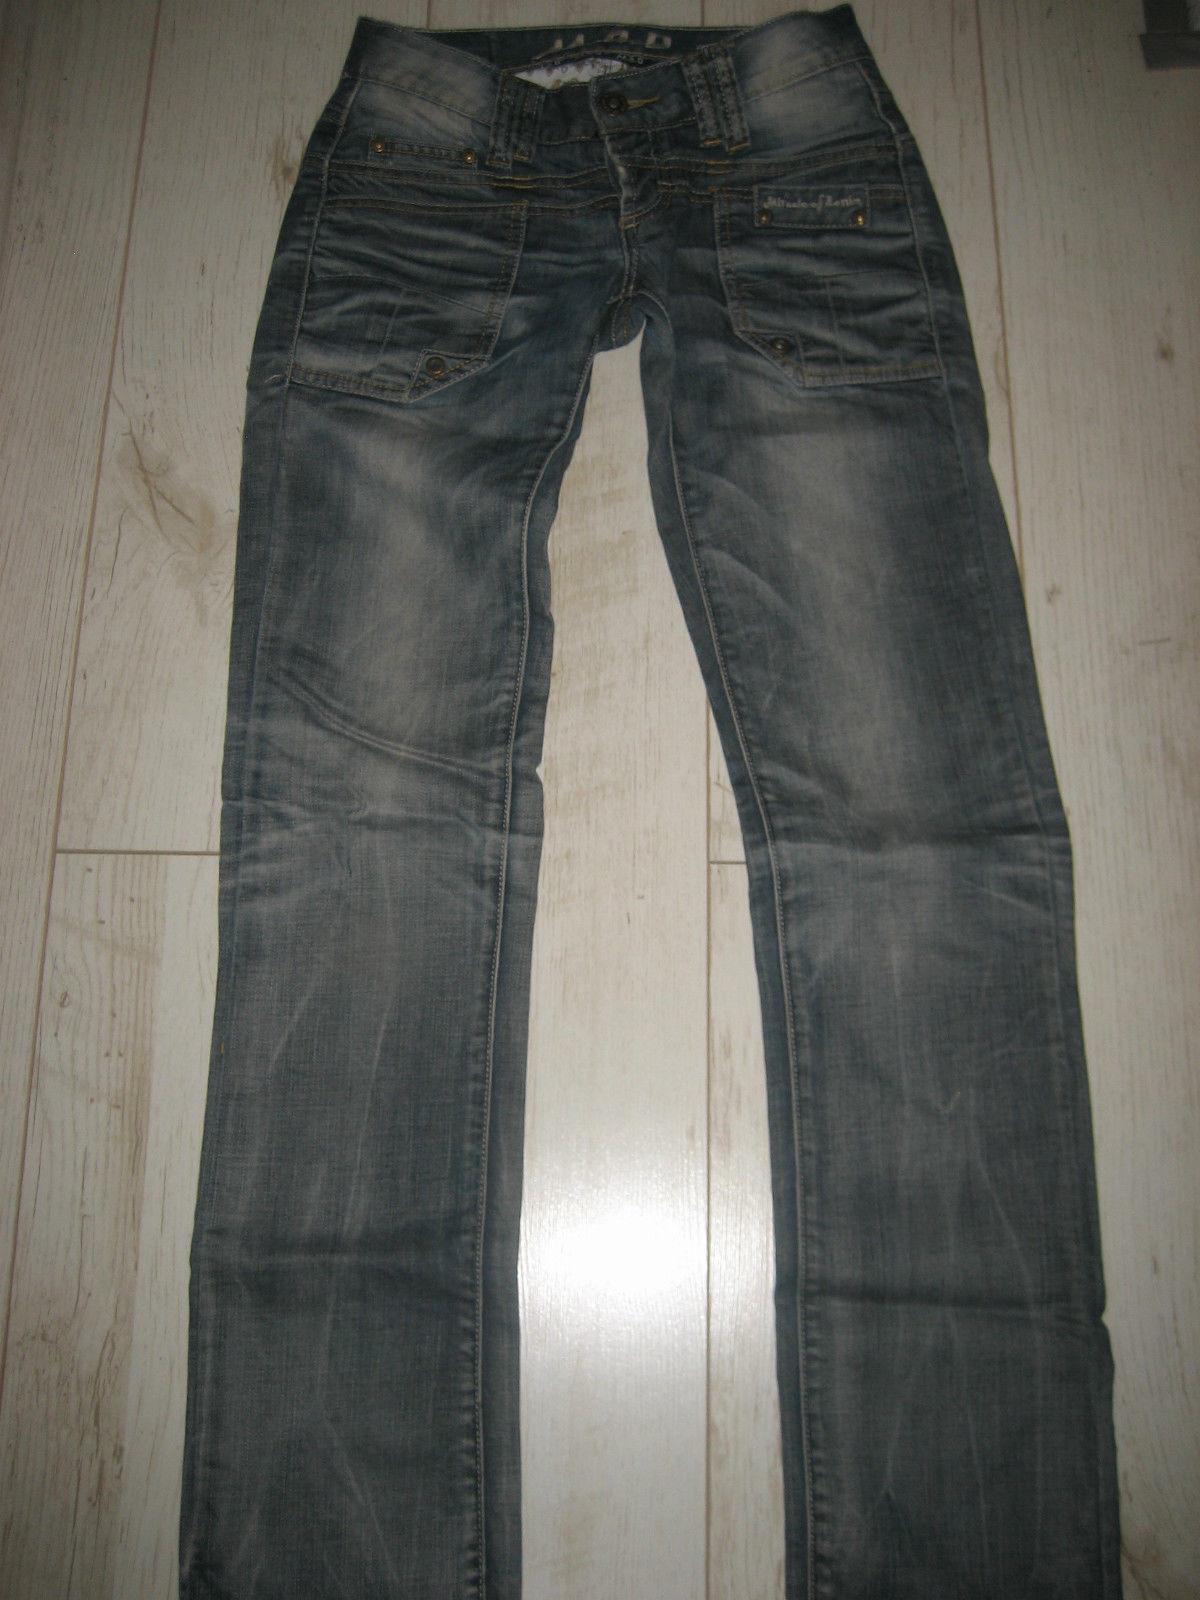 Neuwertig coole Jeans der der der Marke M.O.D.Gr. 26 34 Modell Cheryl sexy | Kunde zuerst  8960c5